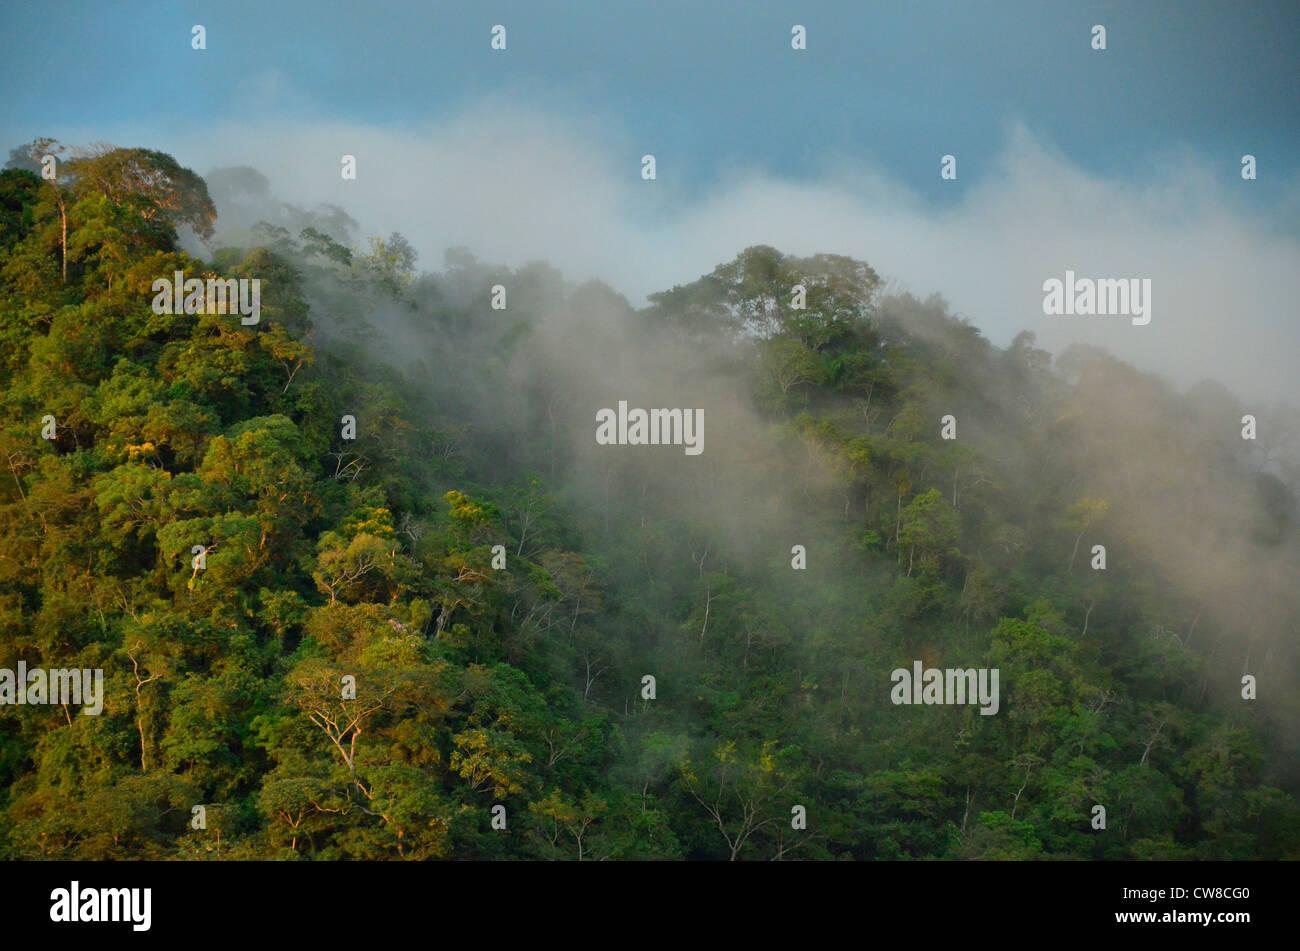 Rurrenabaque, Beni river, Bolivia. Amazon jungle and cloud forest - Stock Image